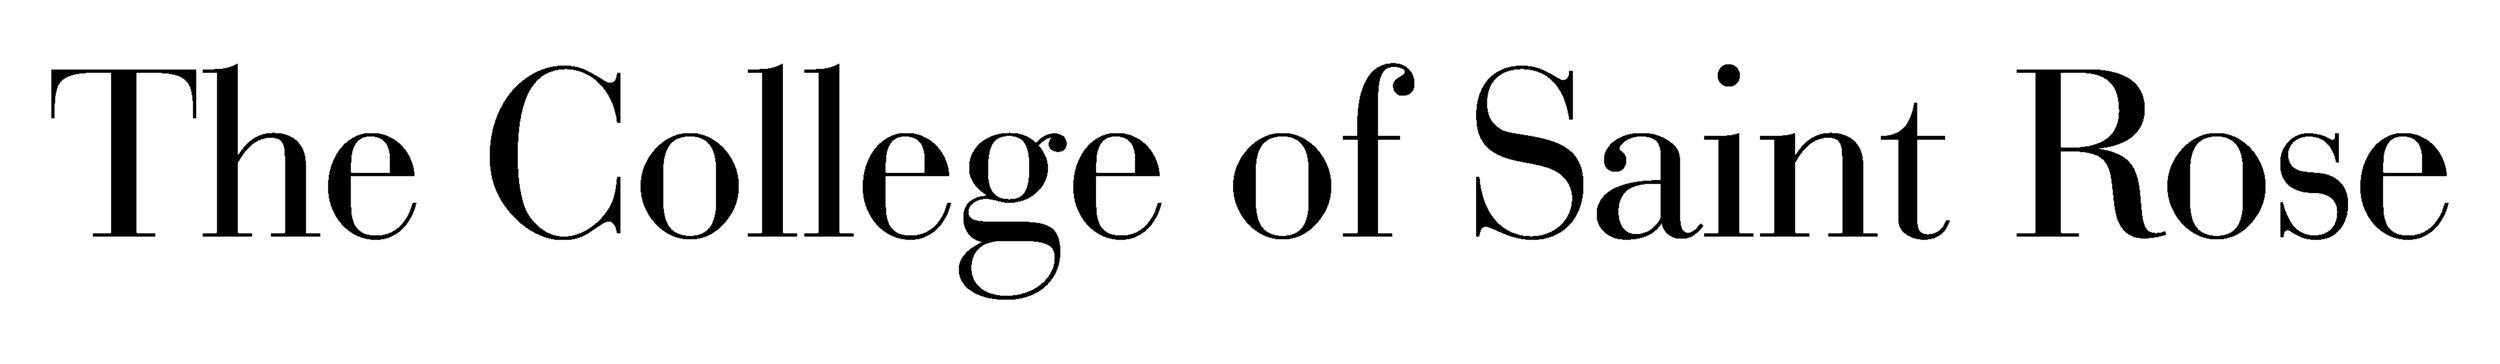 The_College_of_Saint_Rose_Logo.JPEG